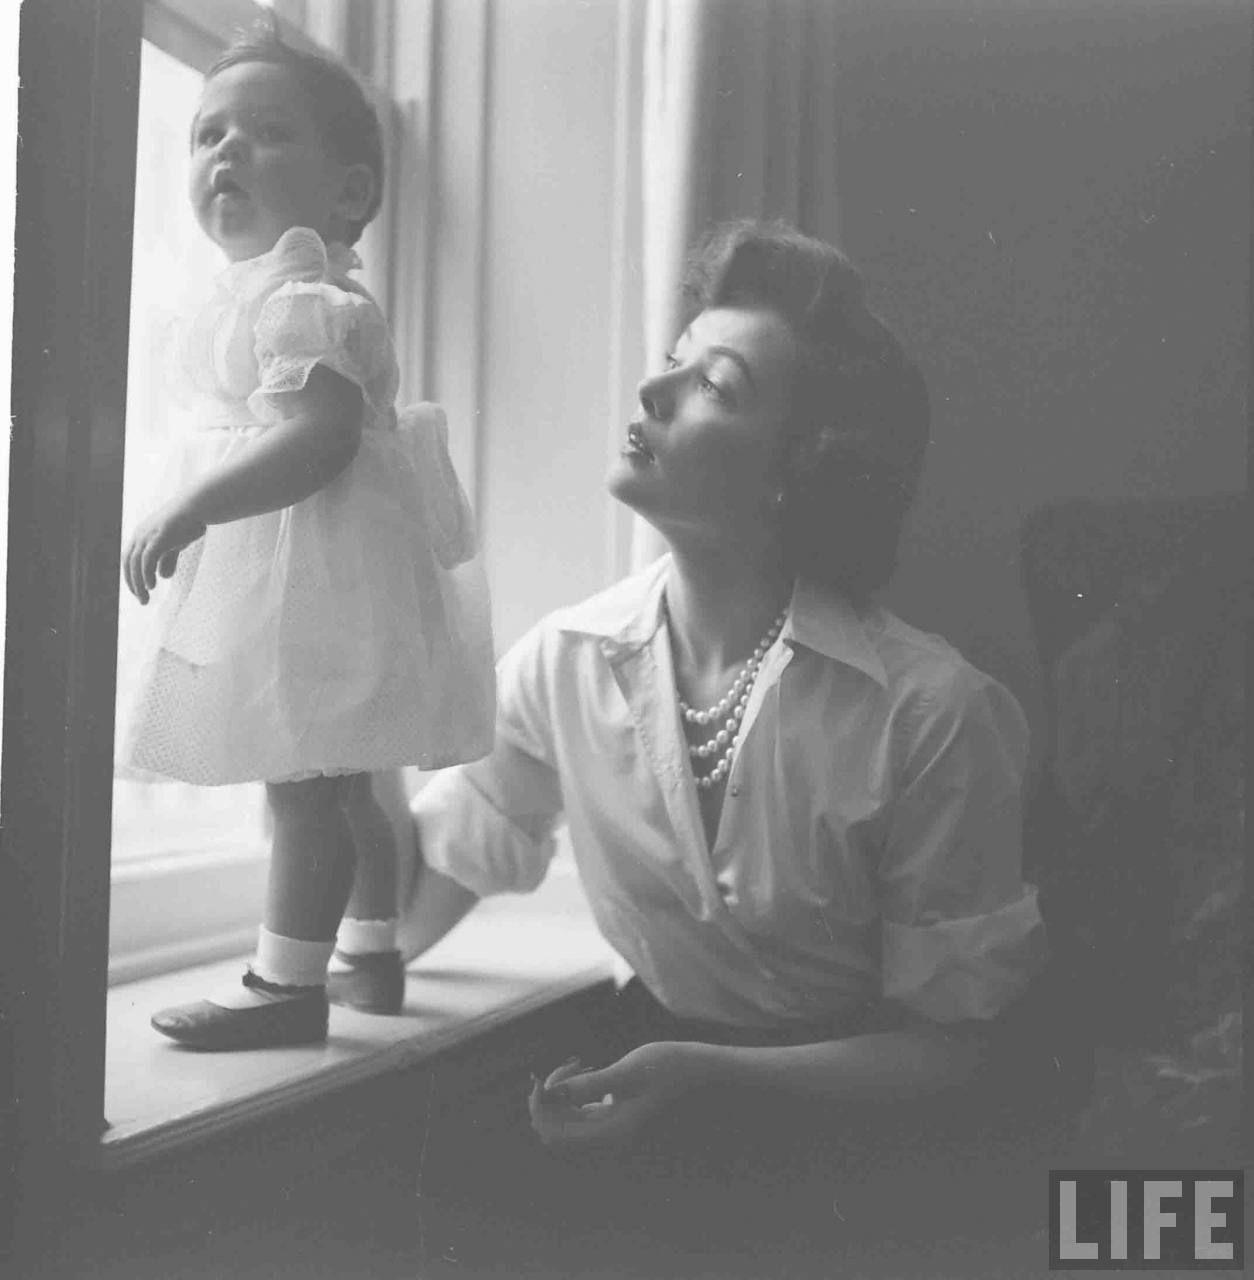 Man Tailored Shirts . November 11, 1949 . Photo by Gordon Parks